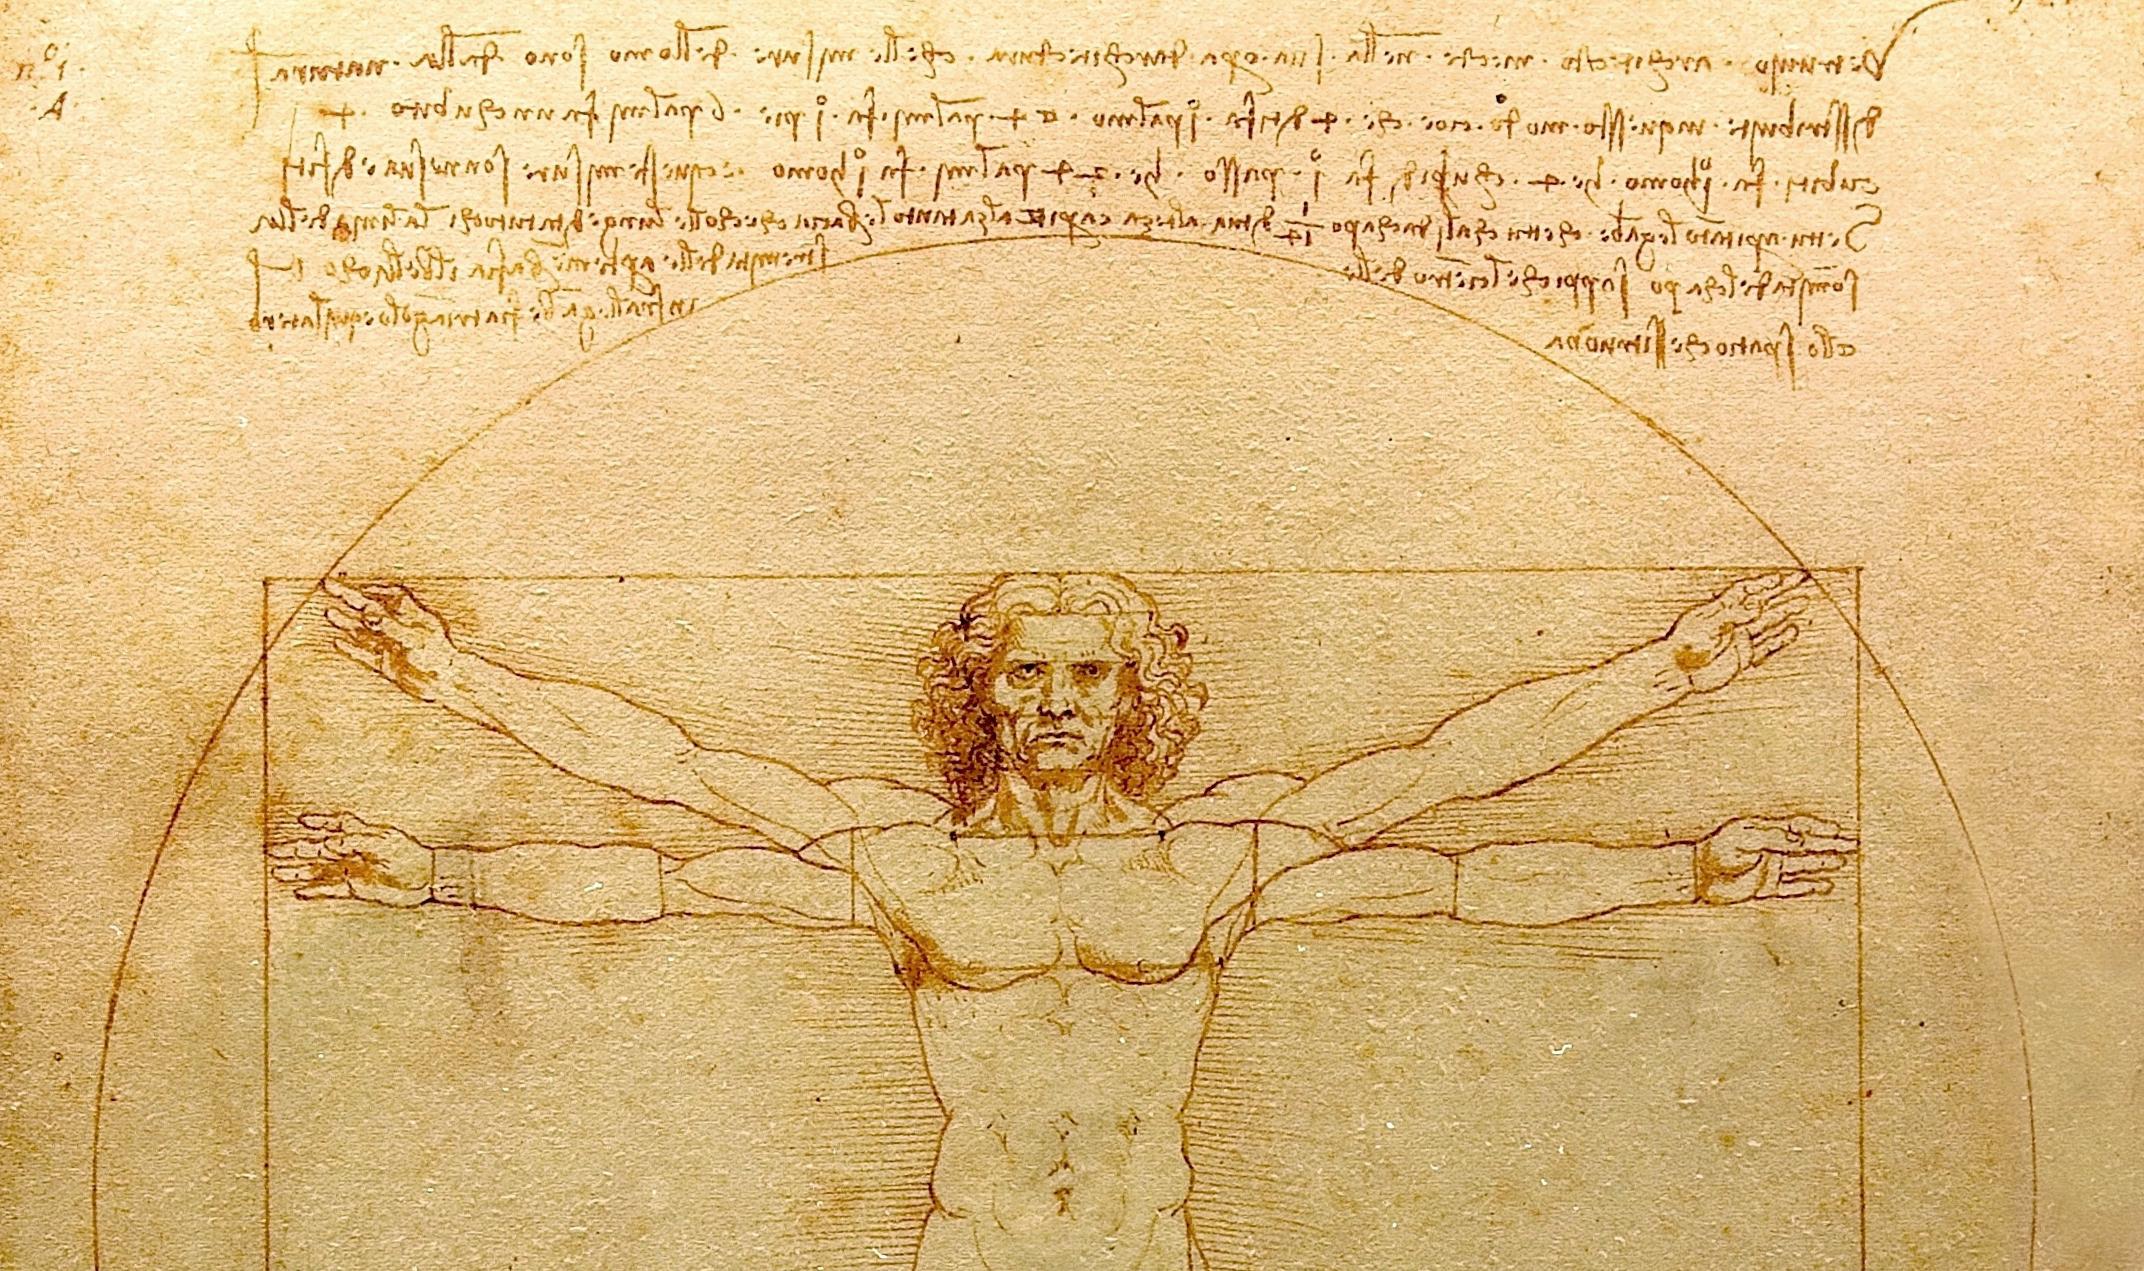 O ambicioso plano de reconstruir o genoma de Leonardo da Vinci -